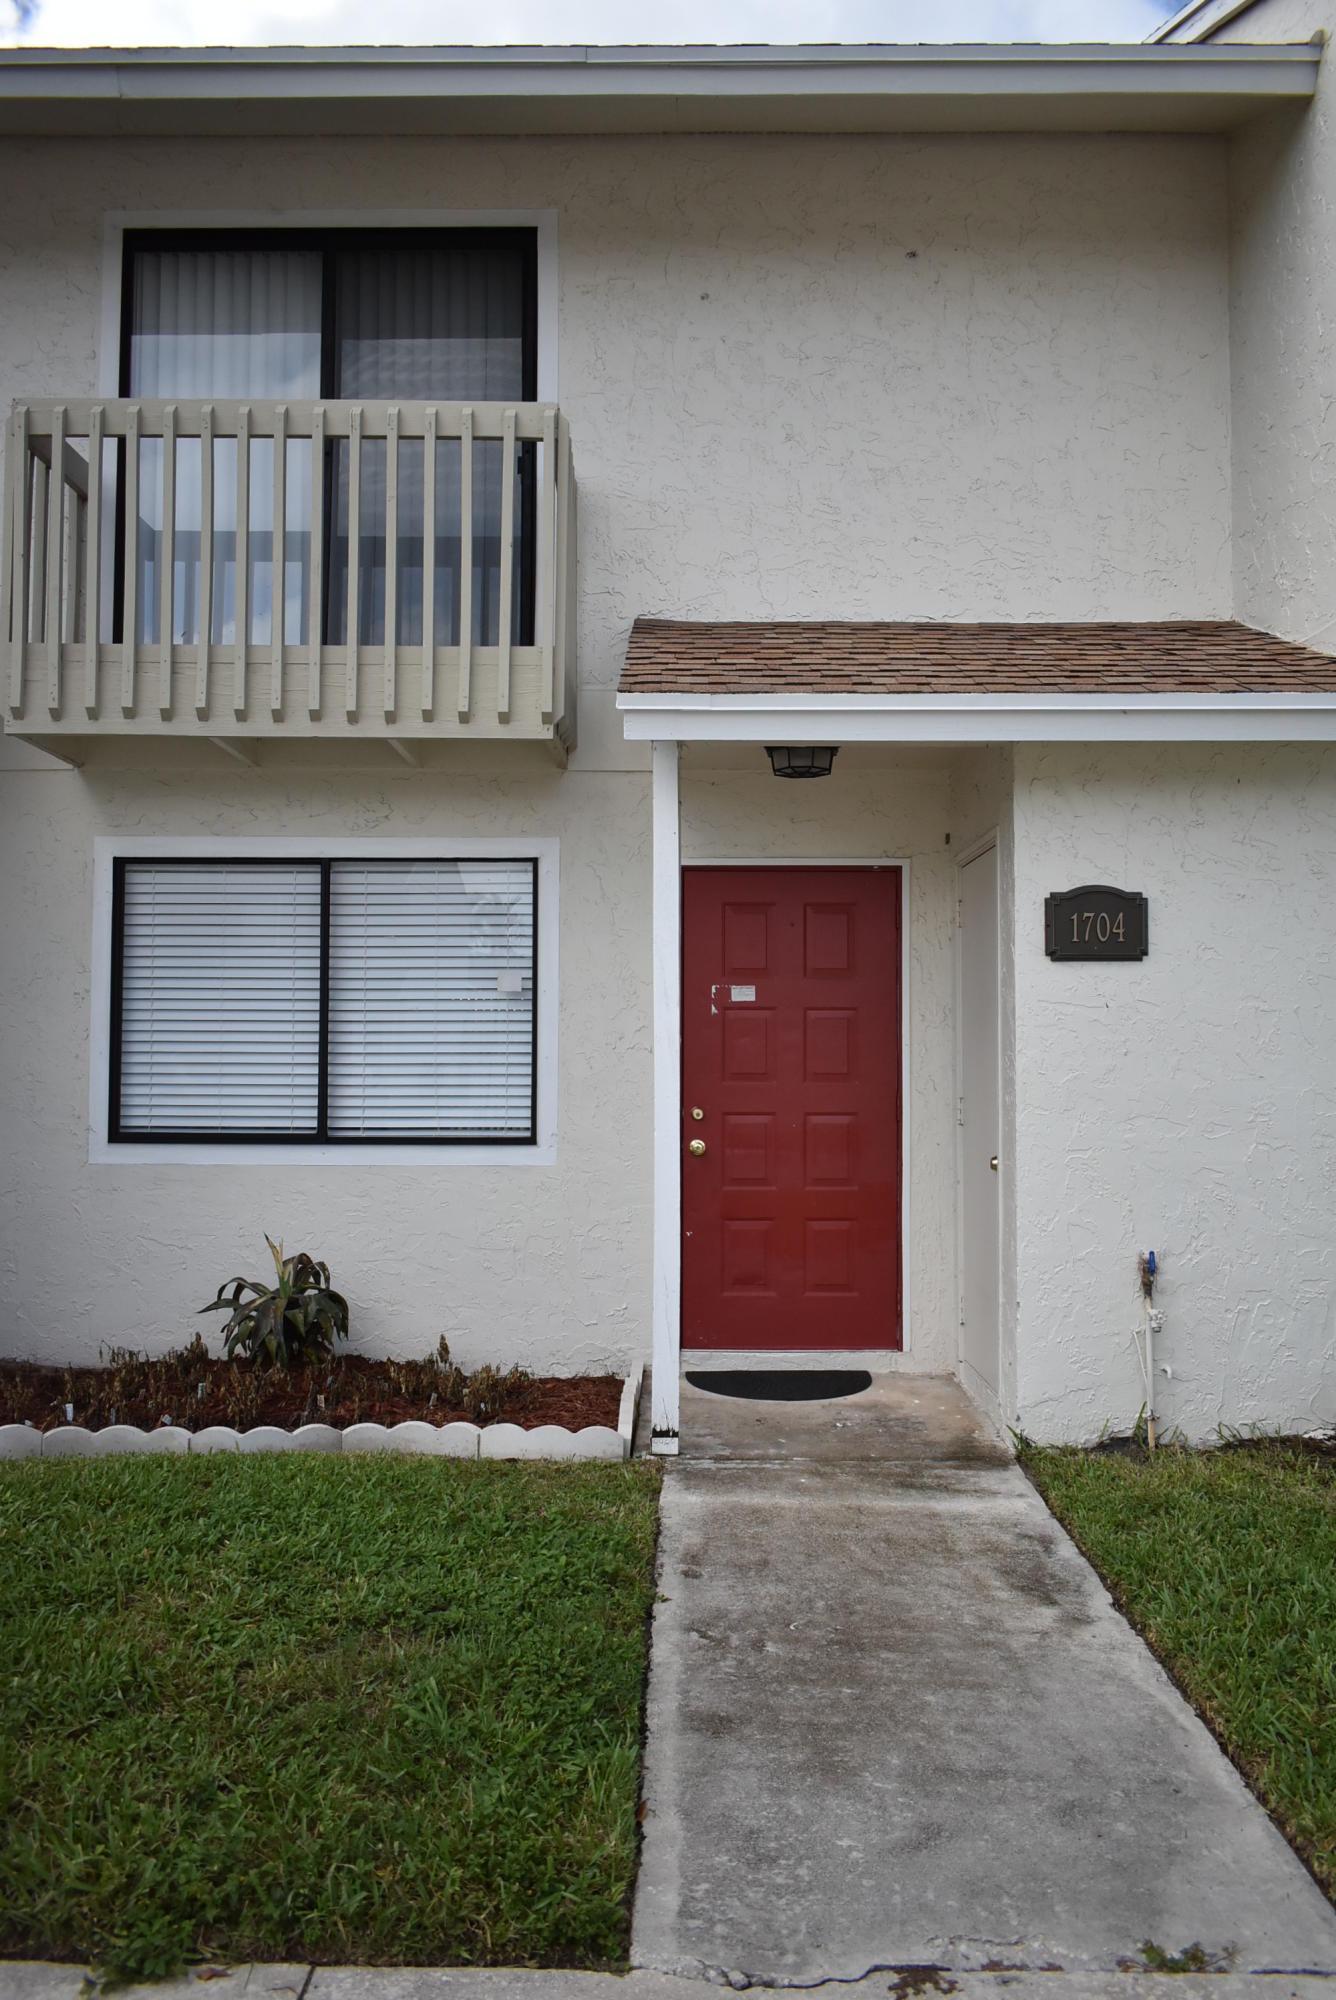 1704 Wharf Lane Lake Worth, FL 33463